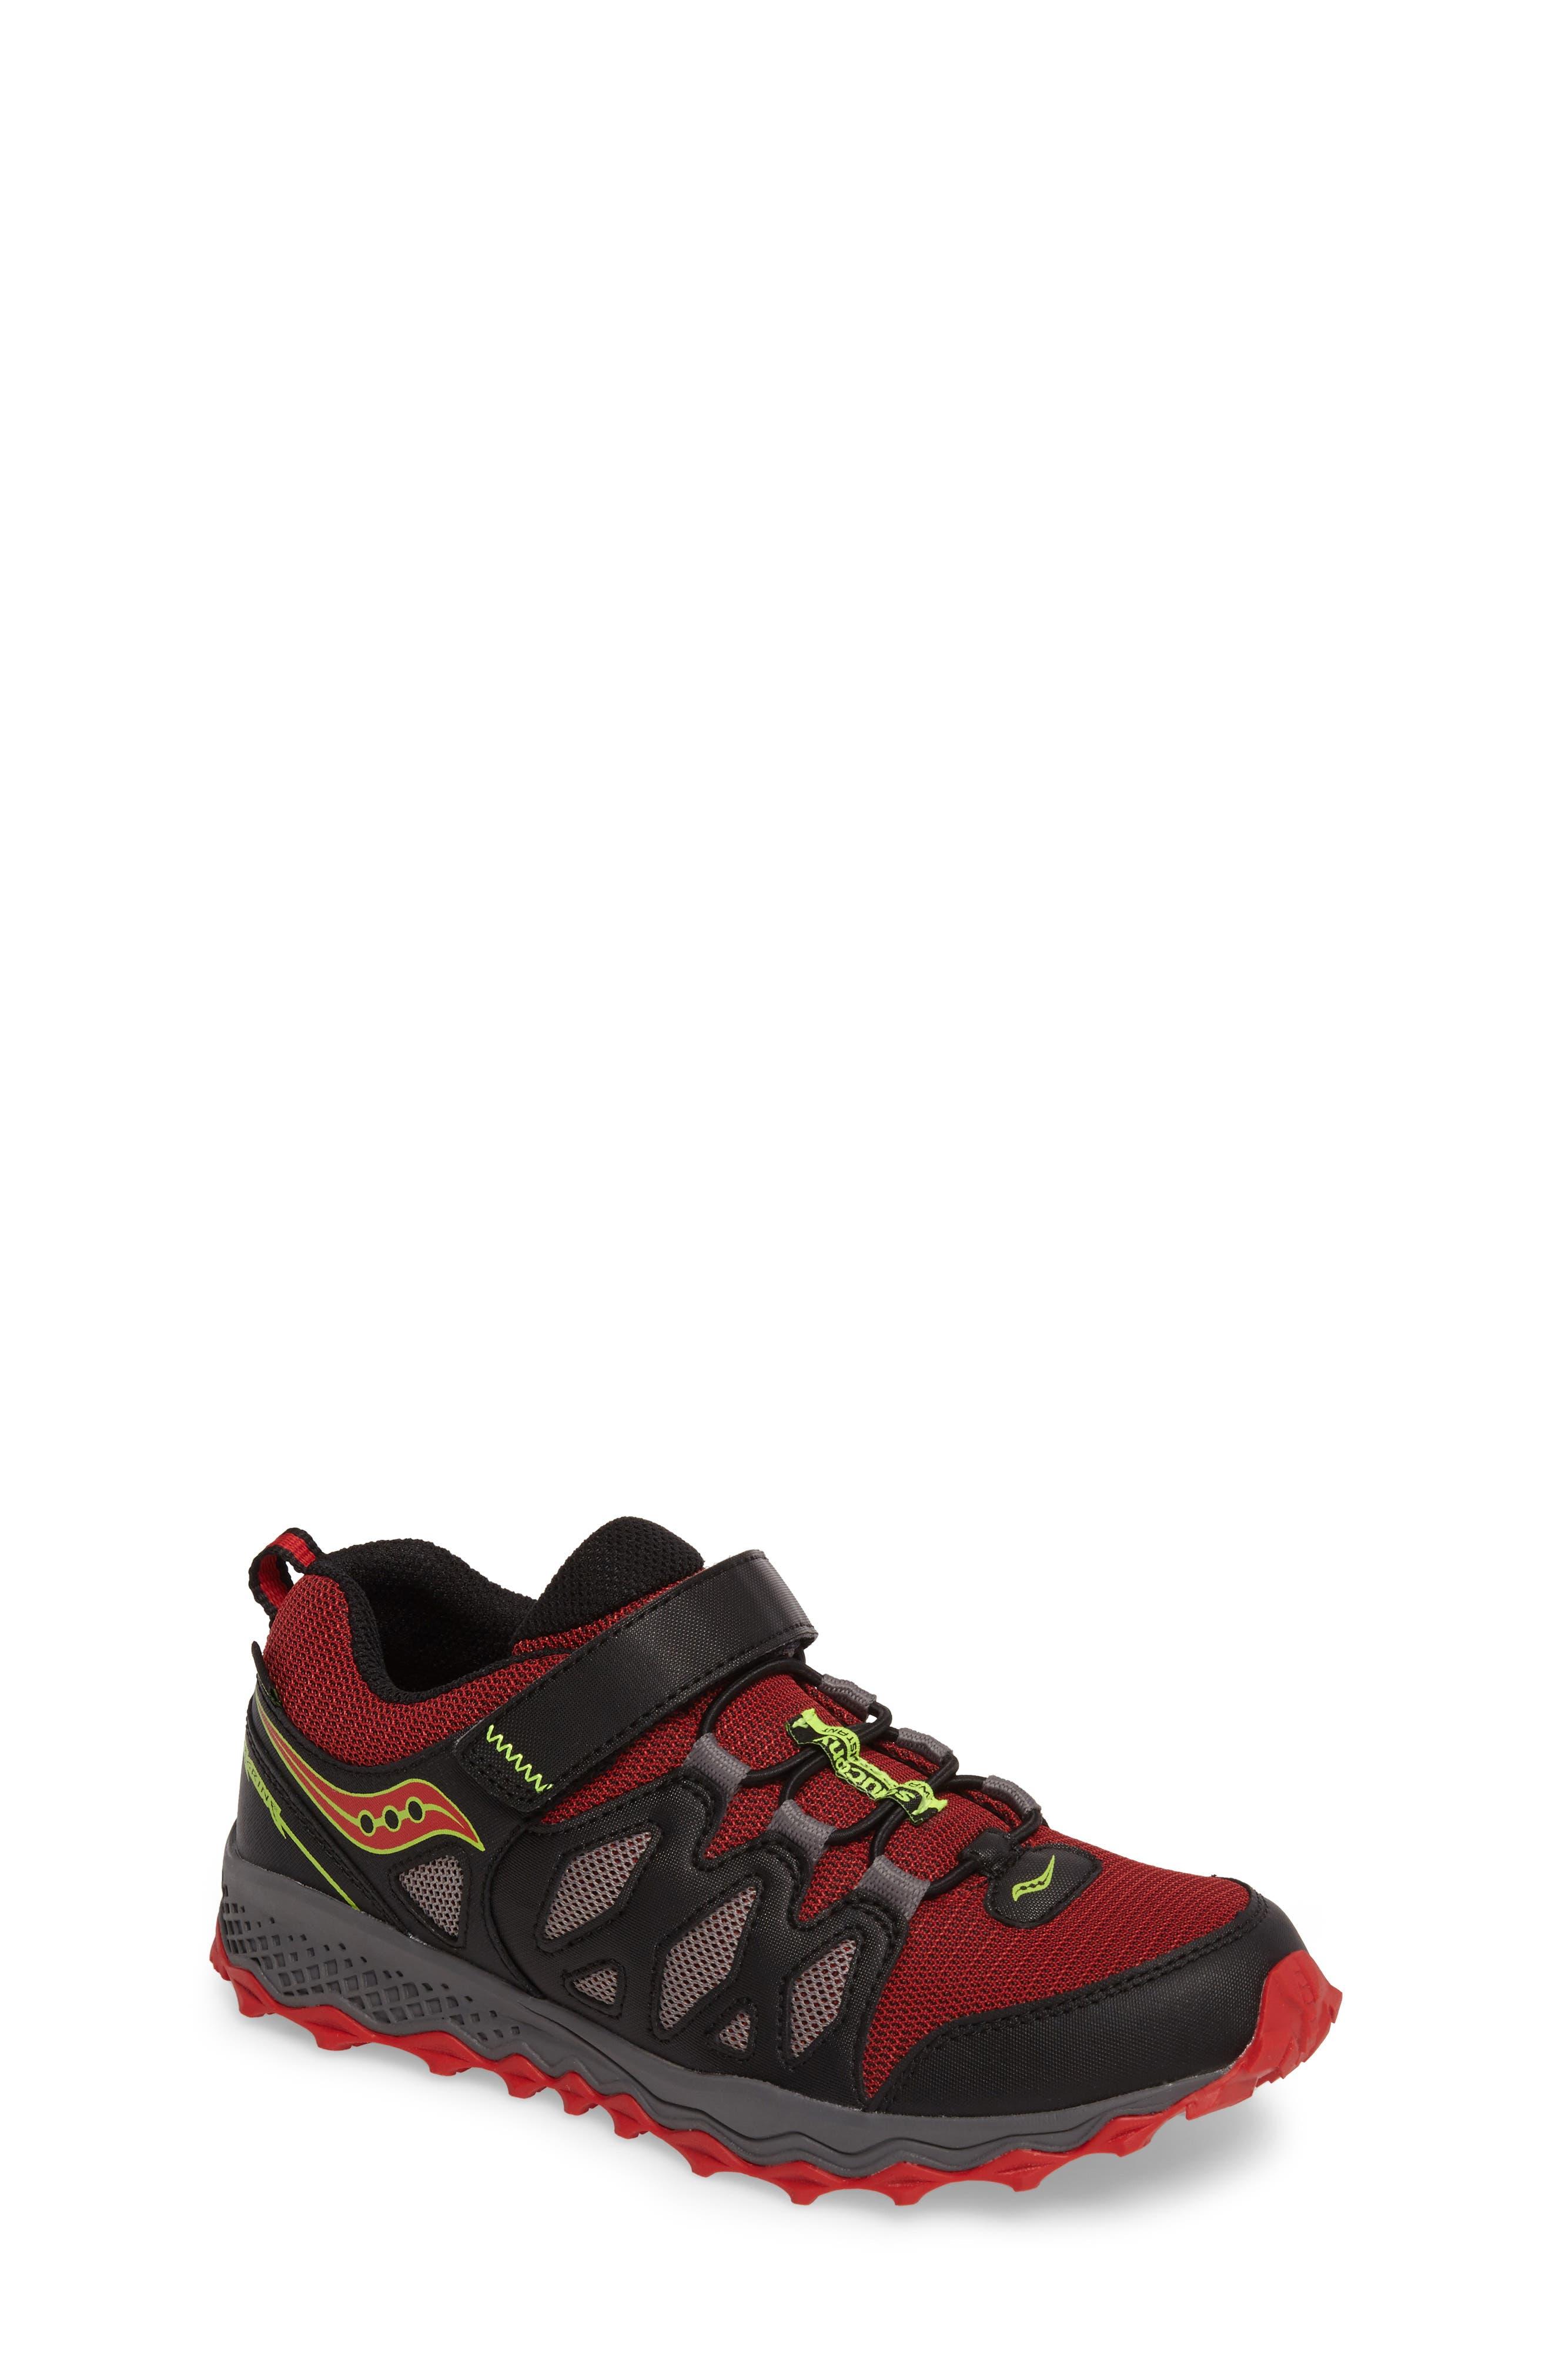 Peregrine Shield Water-Resistant Sneaker,                             Main thumbnail 1, color,